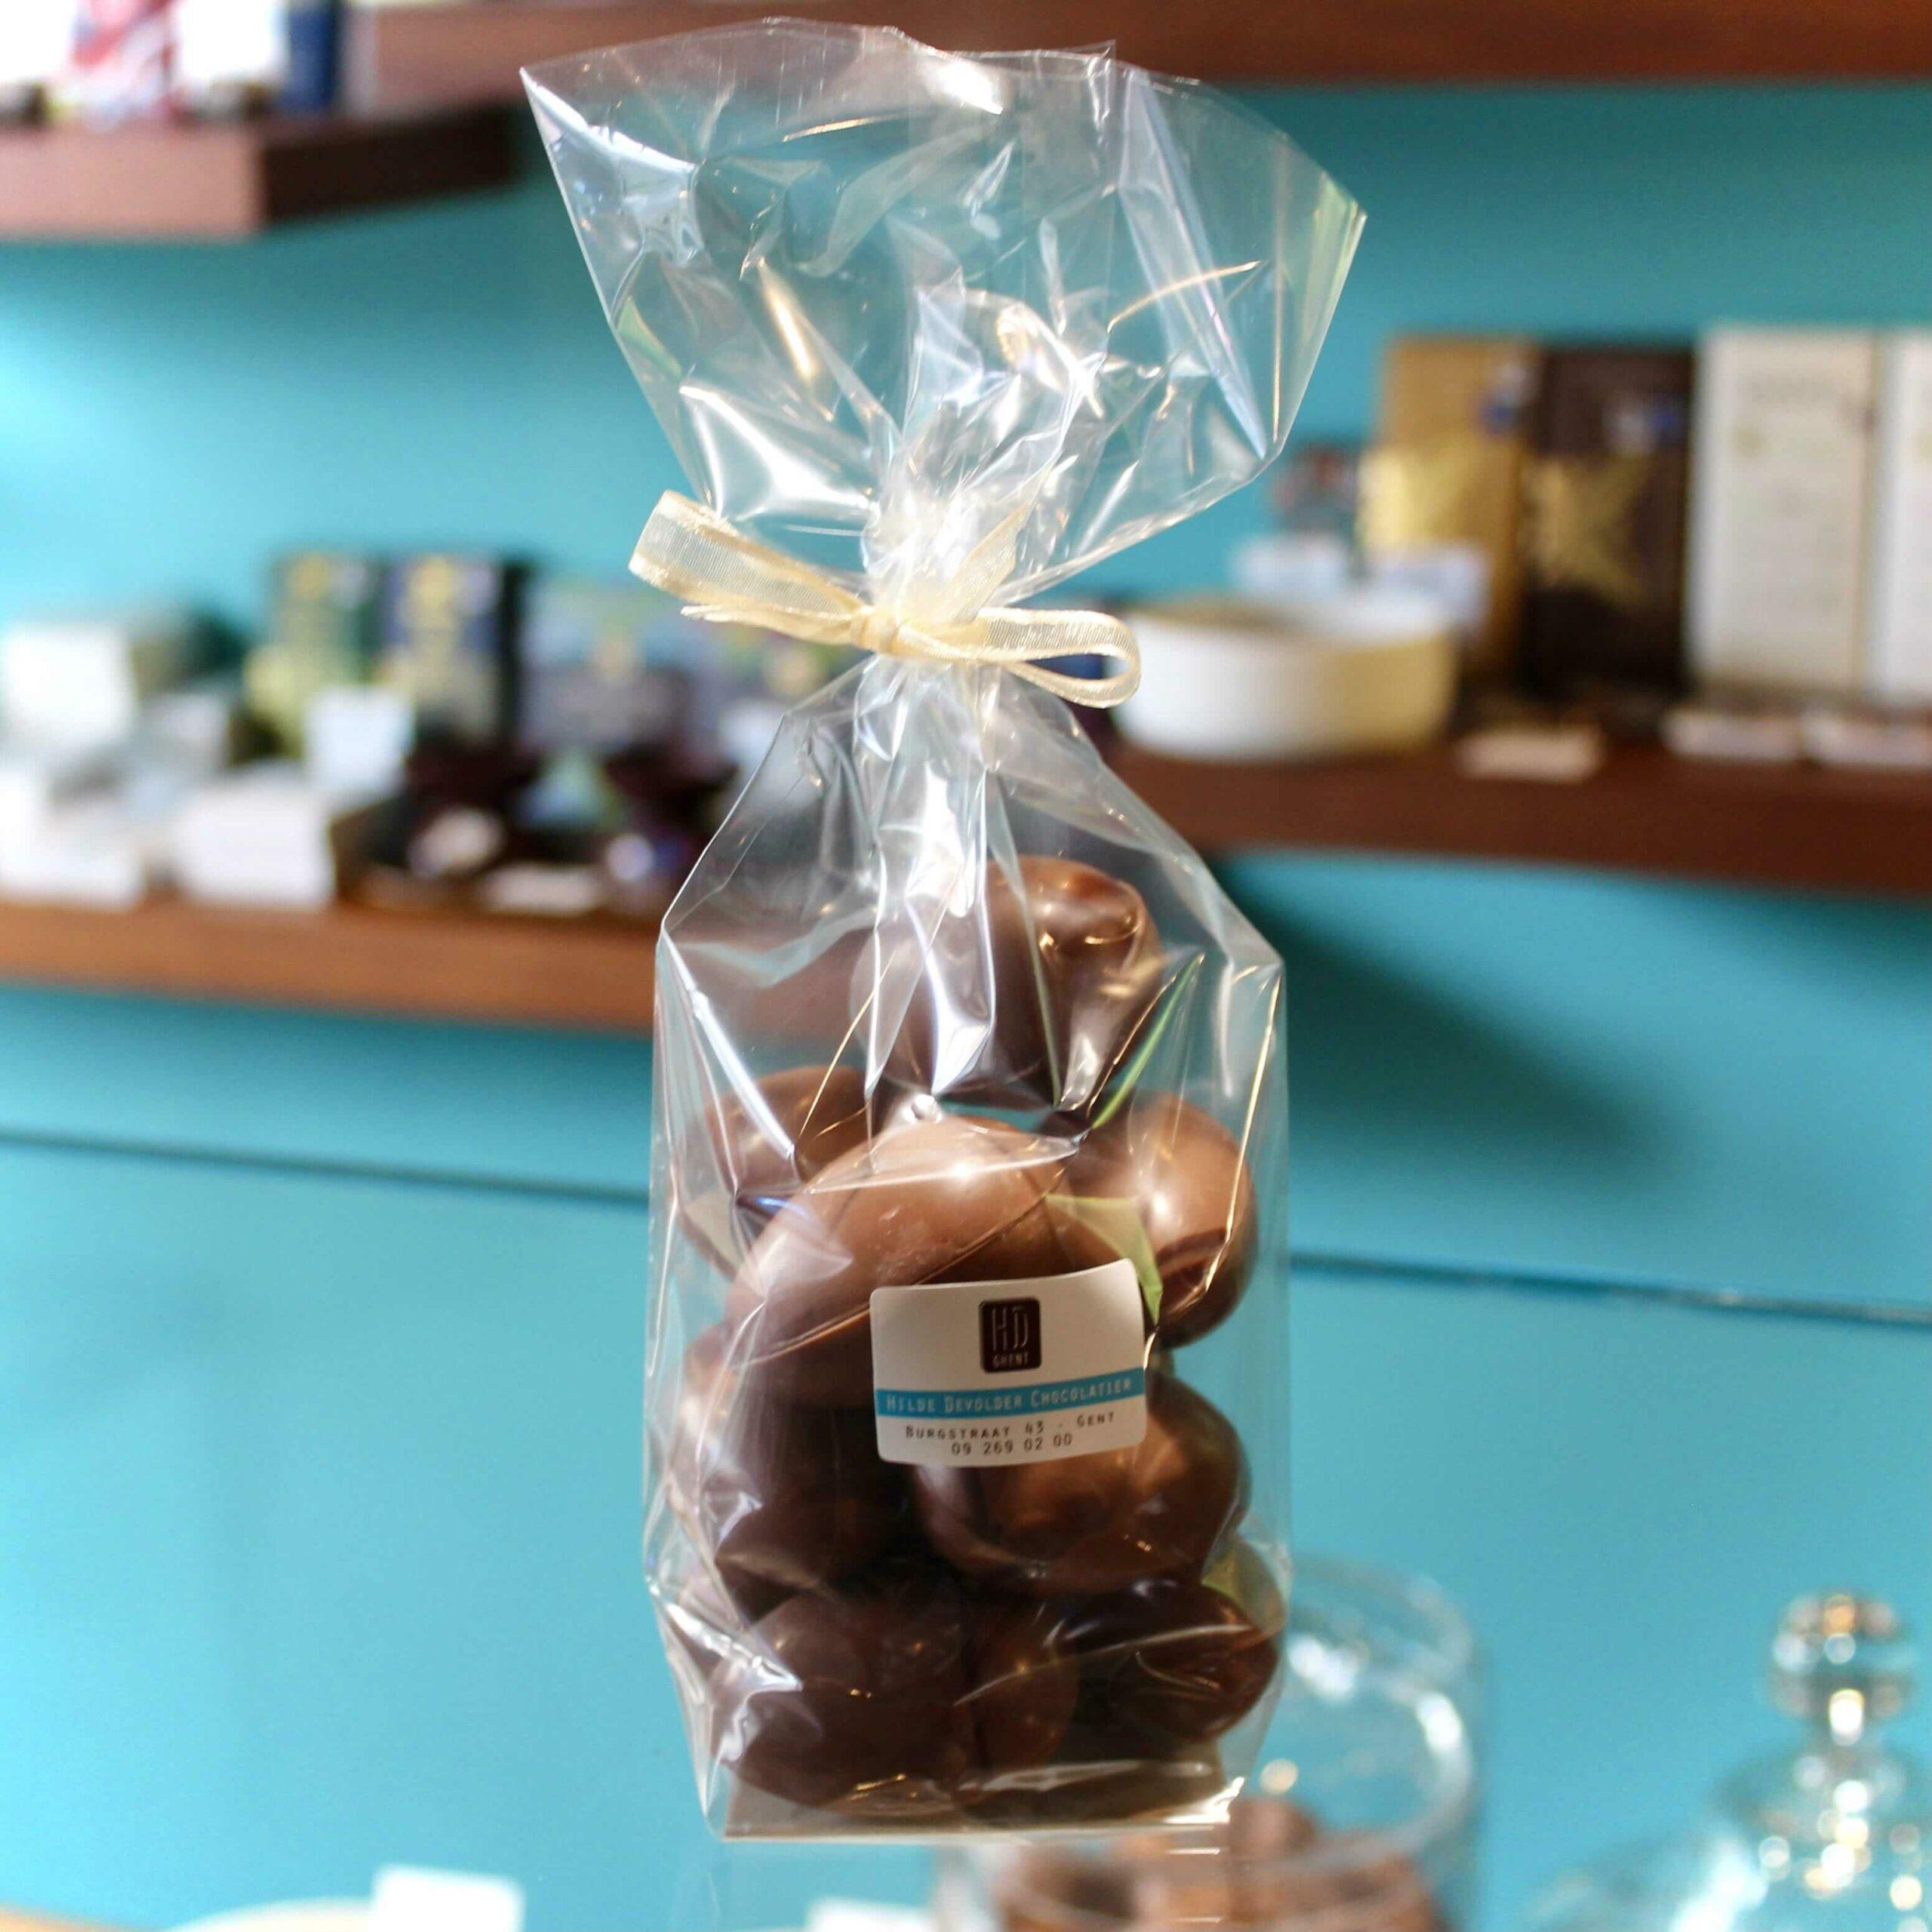 hilde devolder chocolatier easter 2021 hollow easter egg 5 cm milk chocolate